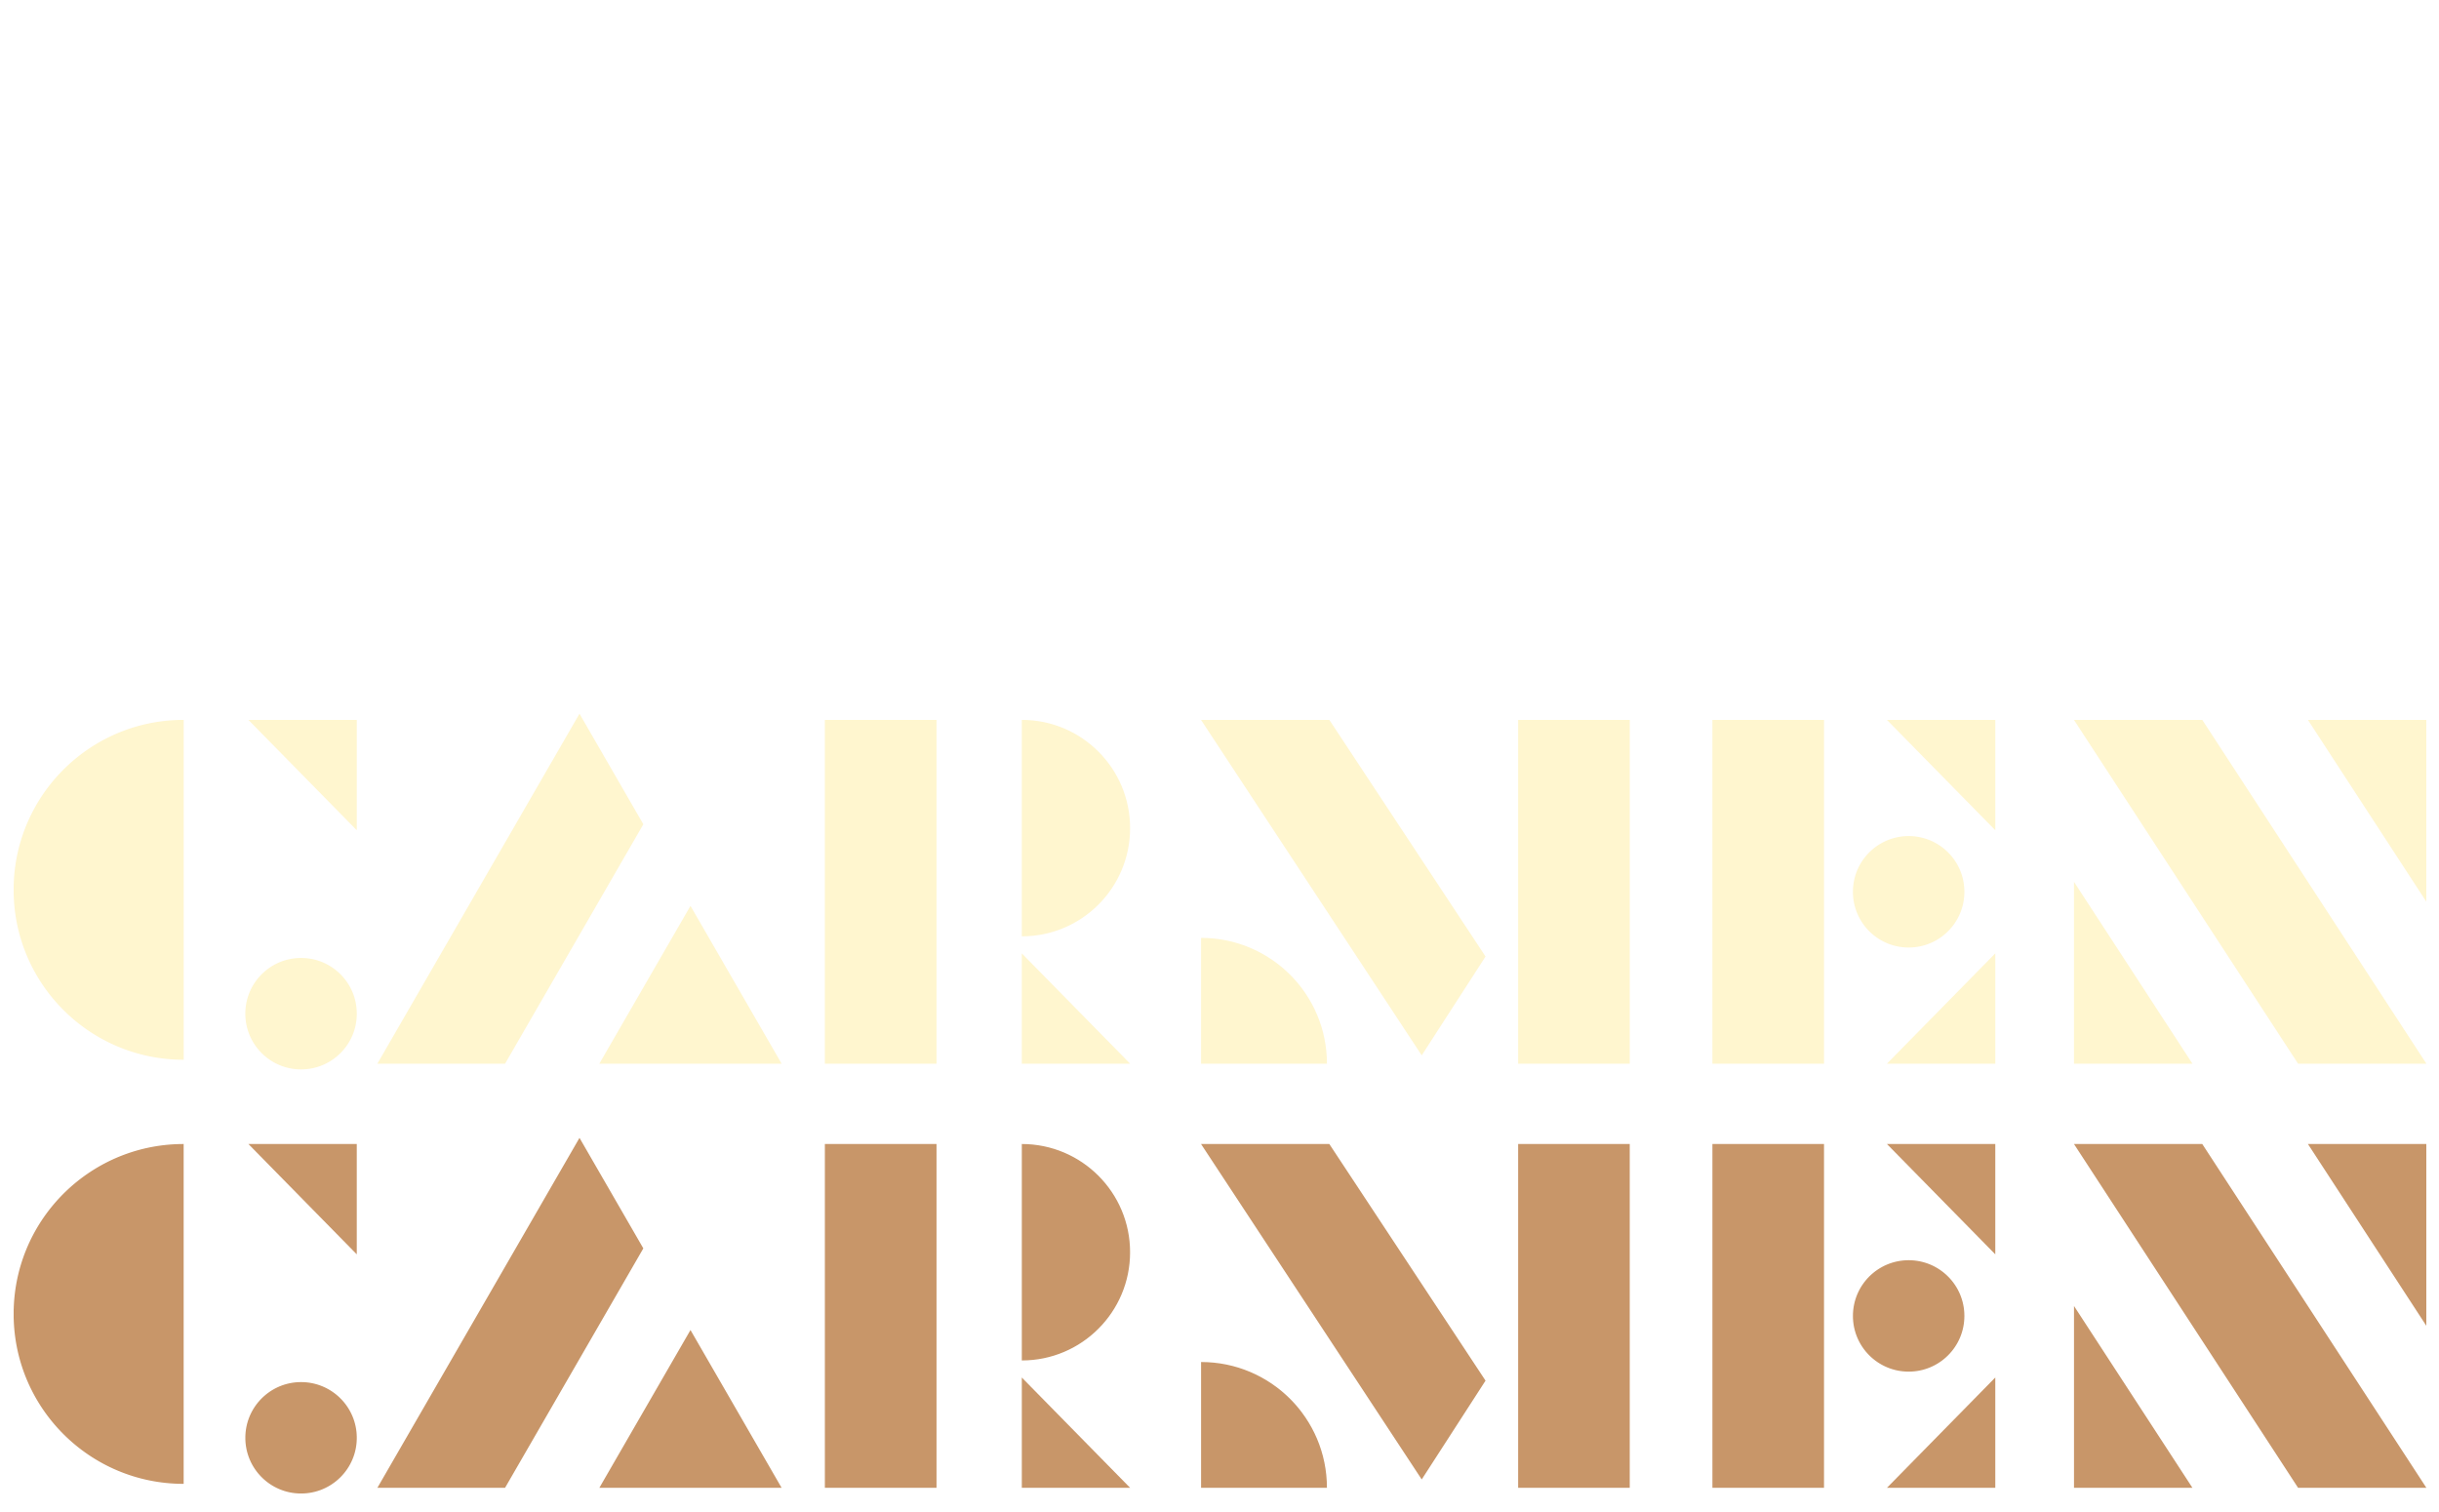 CARMEN-3.png